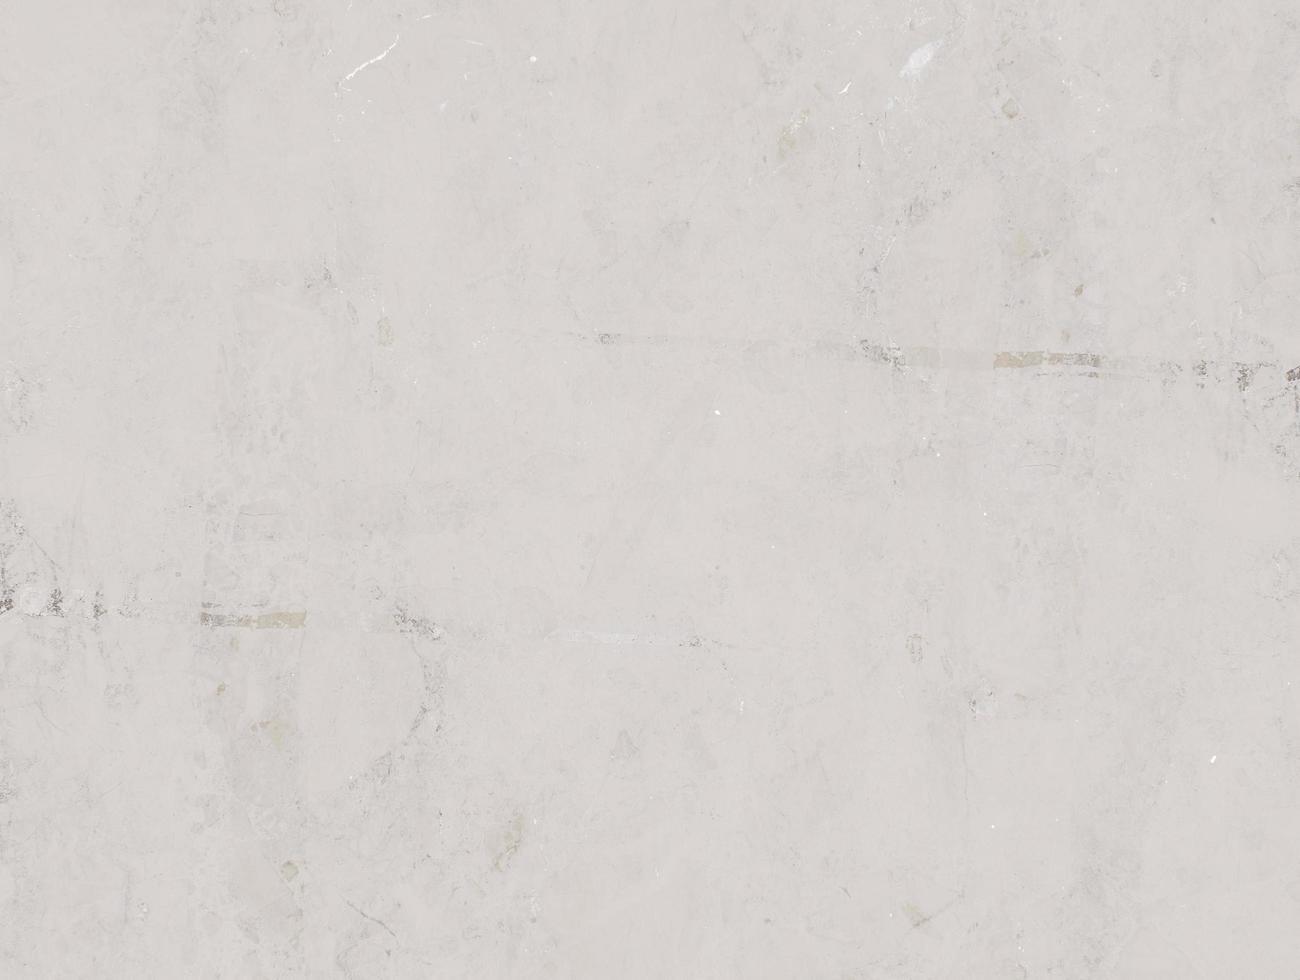 fundo de textura de pedra neutra foto